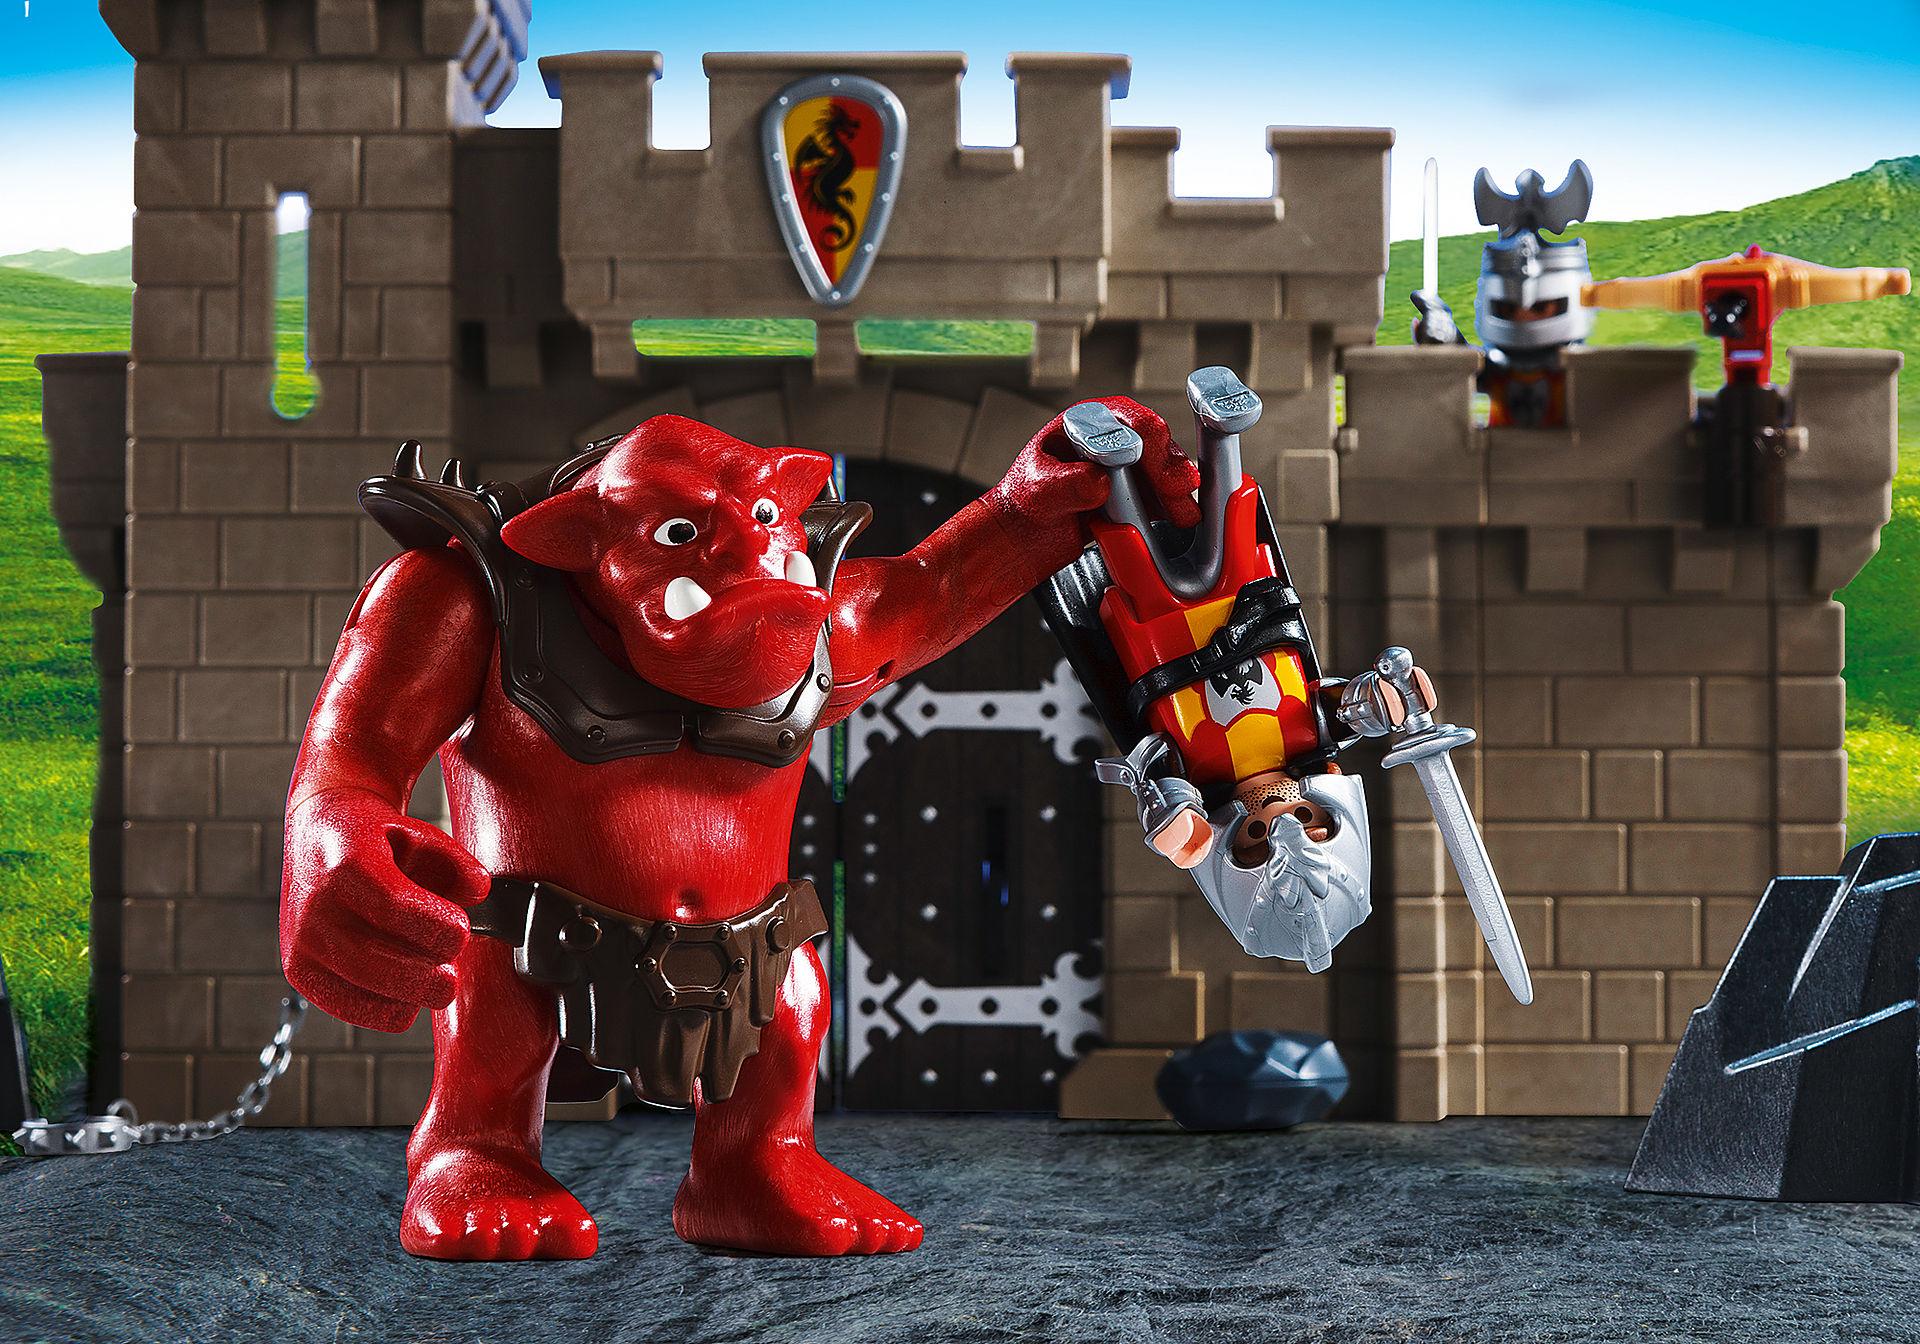 http://media.playmobil.com/i/playmobil/5670_product_extra2/Assalto al castello con troll